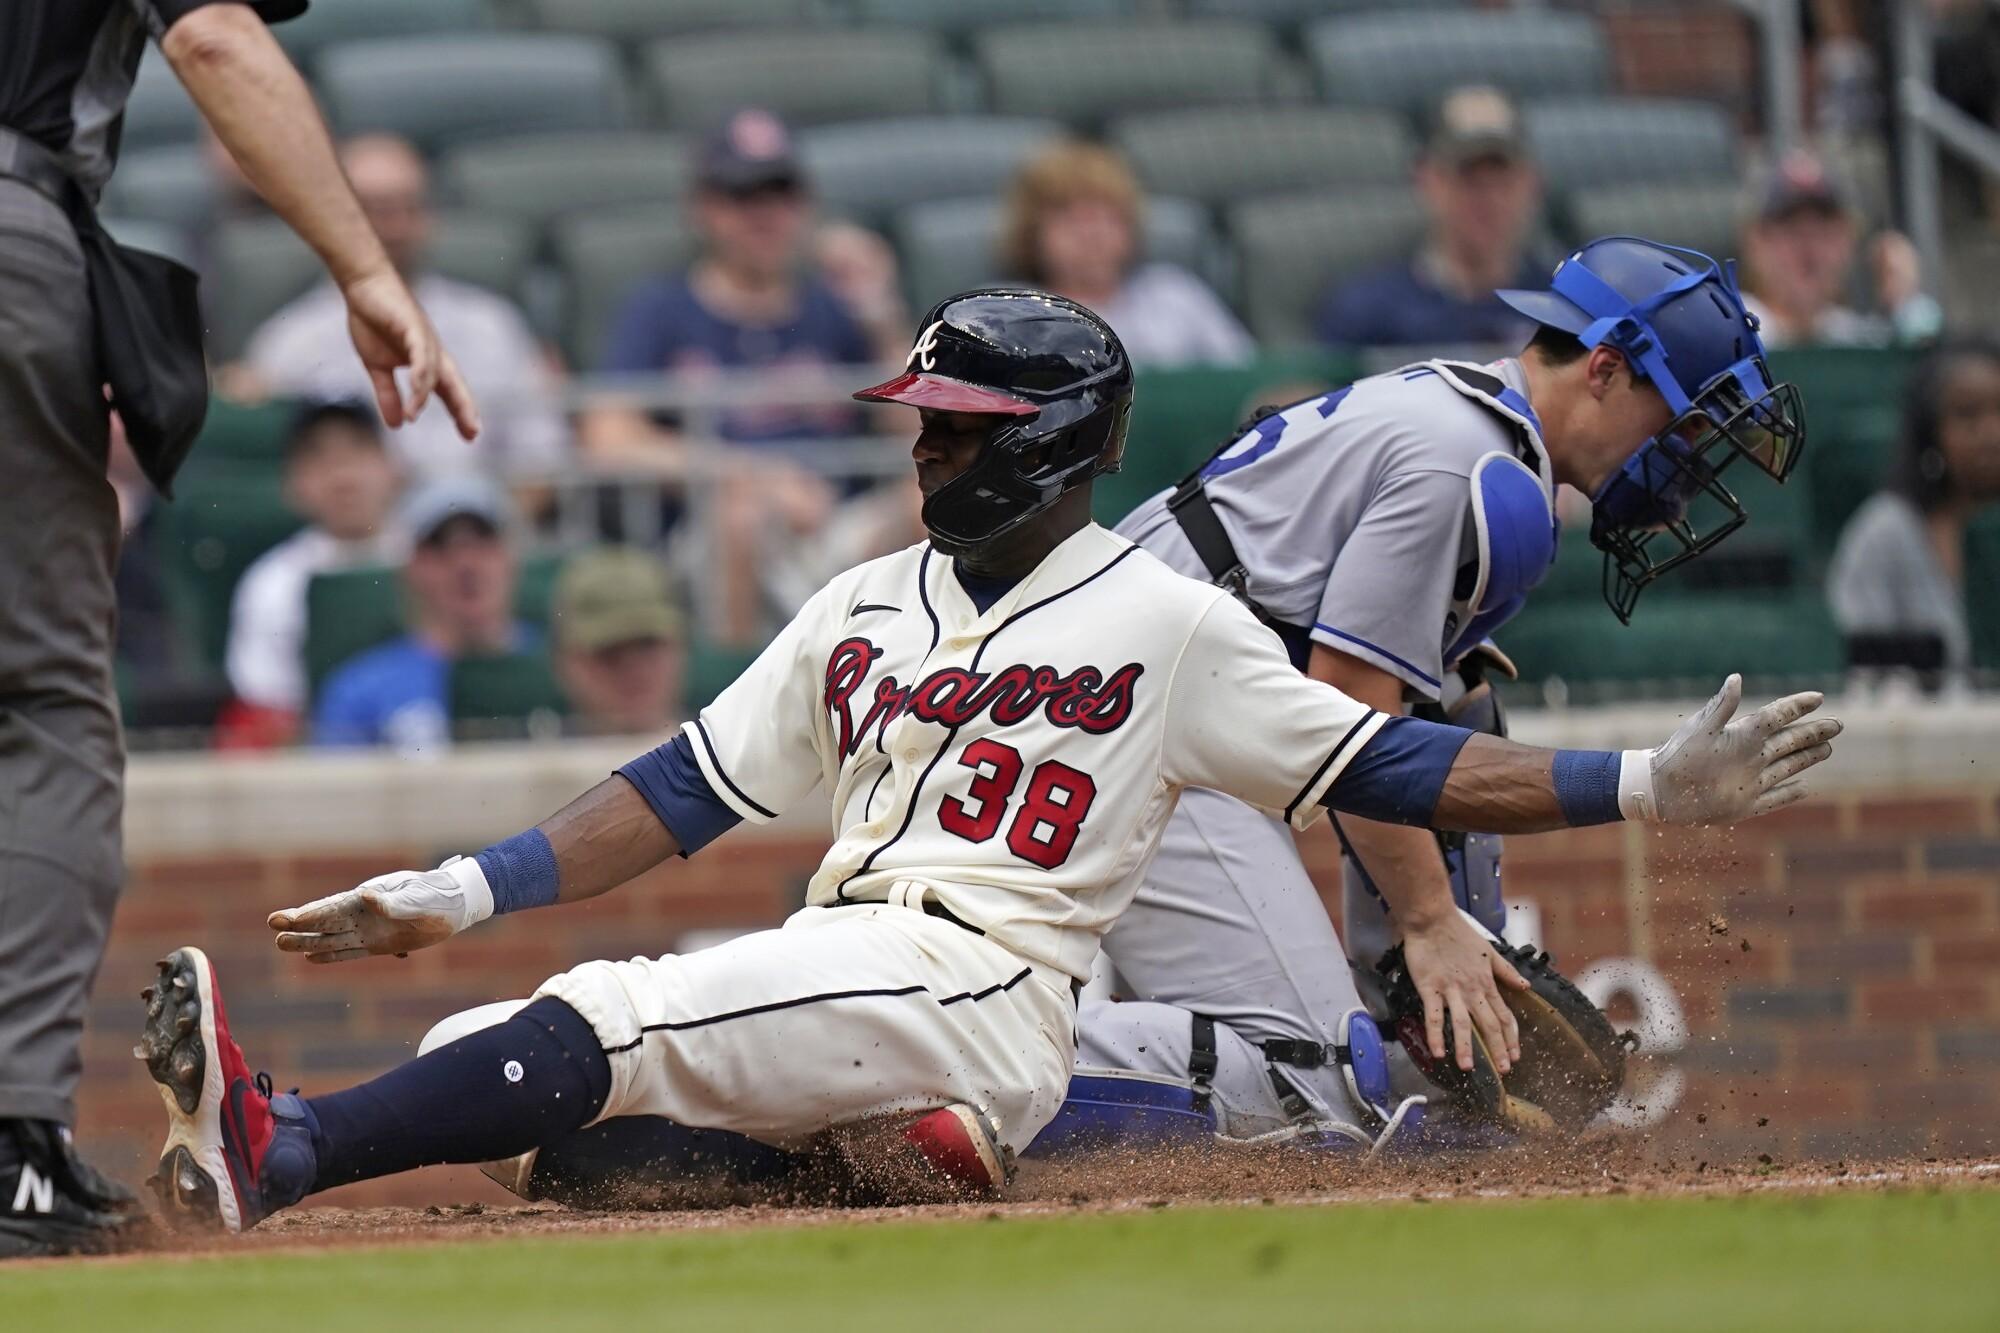 Atlanta's Guillermo Heredia scores next to Dodgers catcher Will Smith.